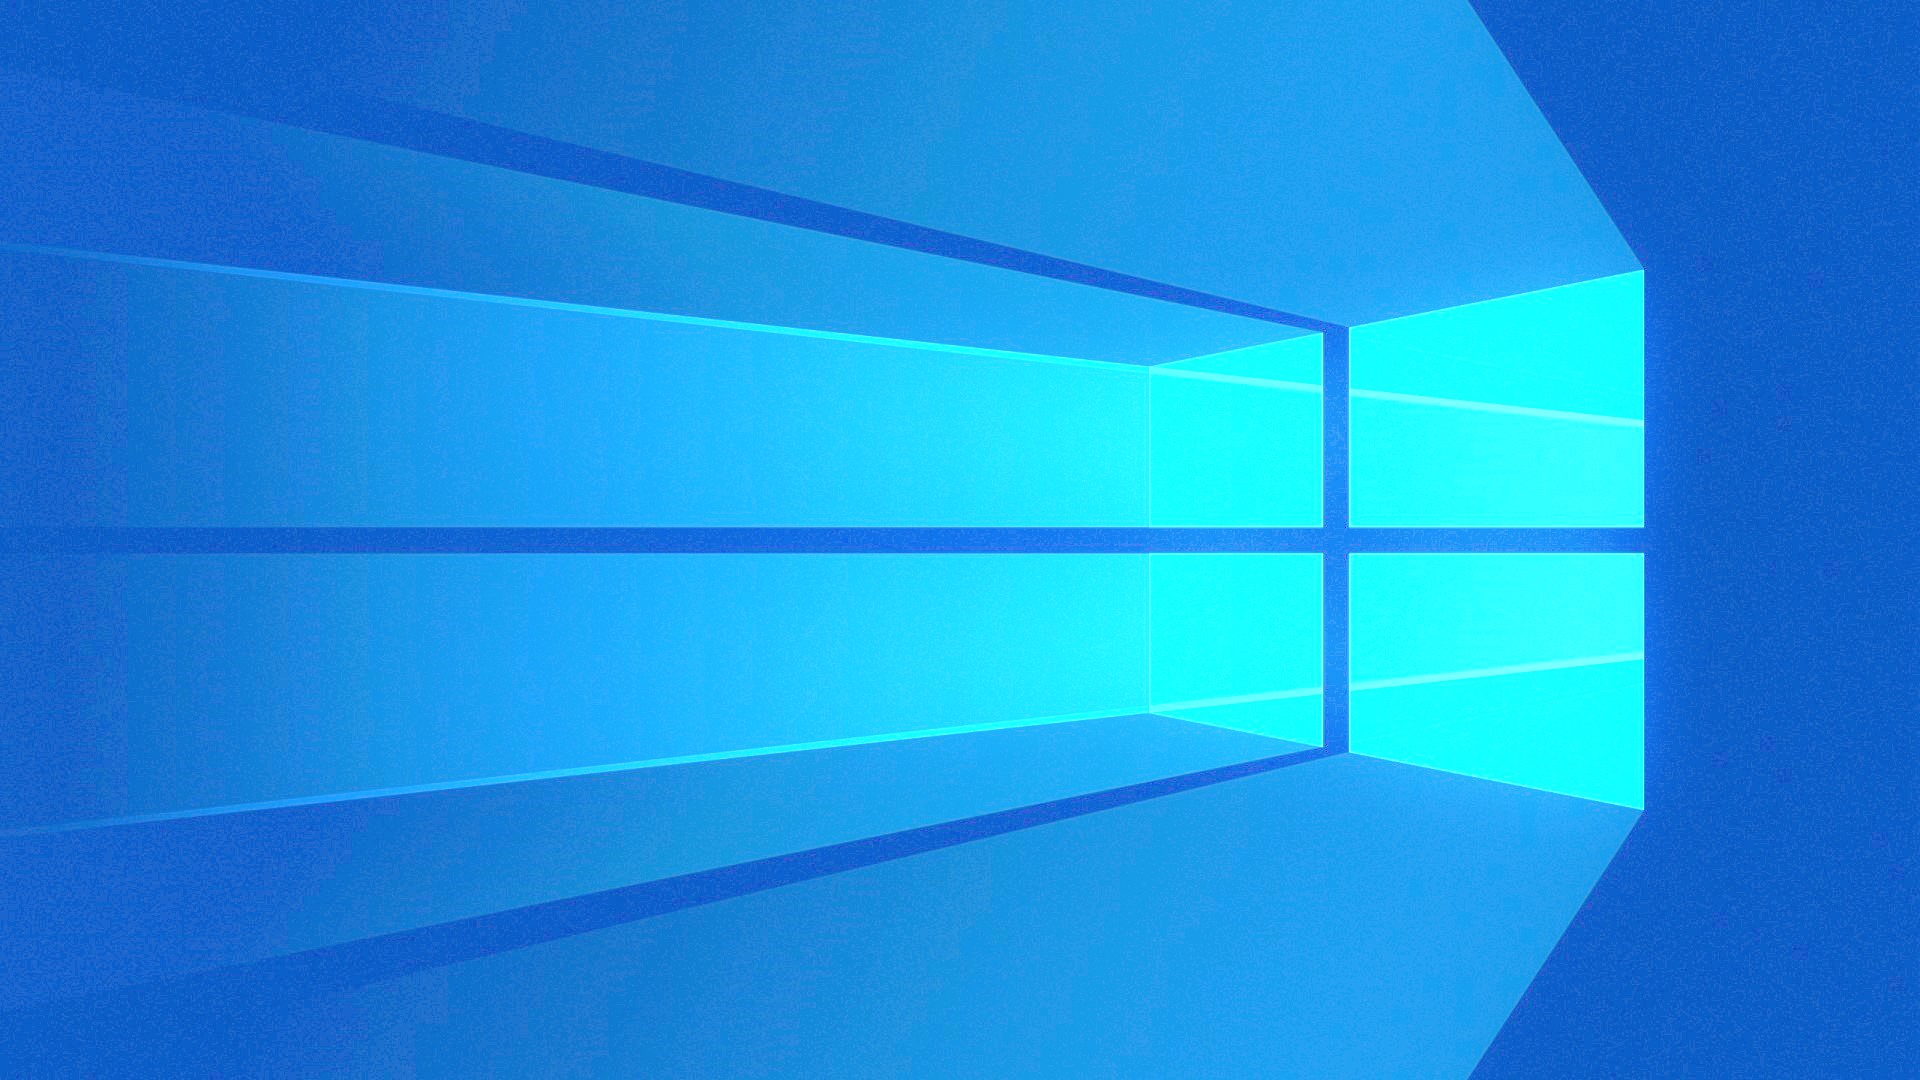 Beautiful and elegant Windows 10 wallpaper